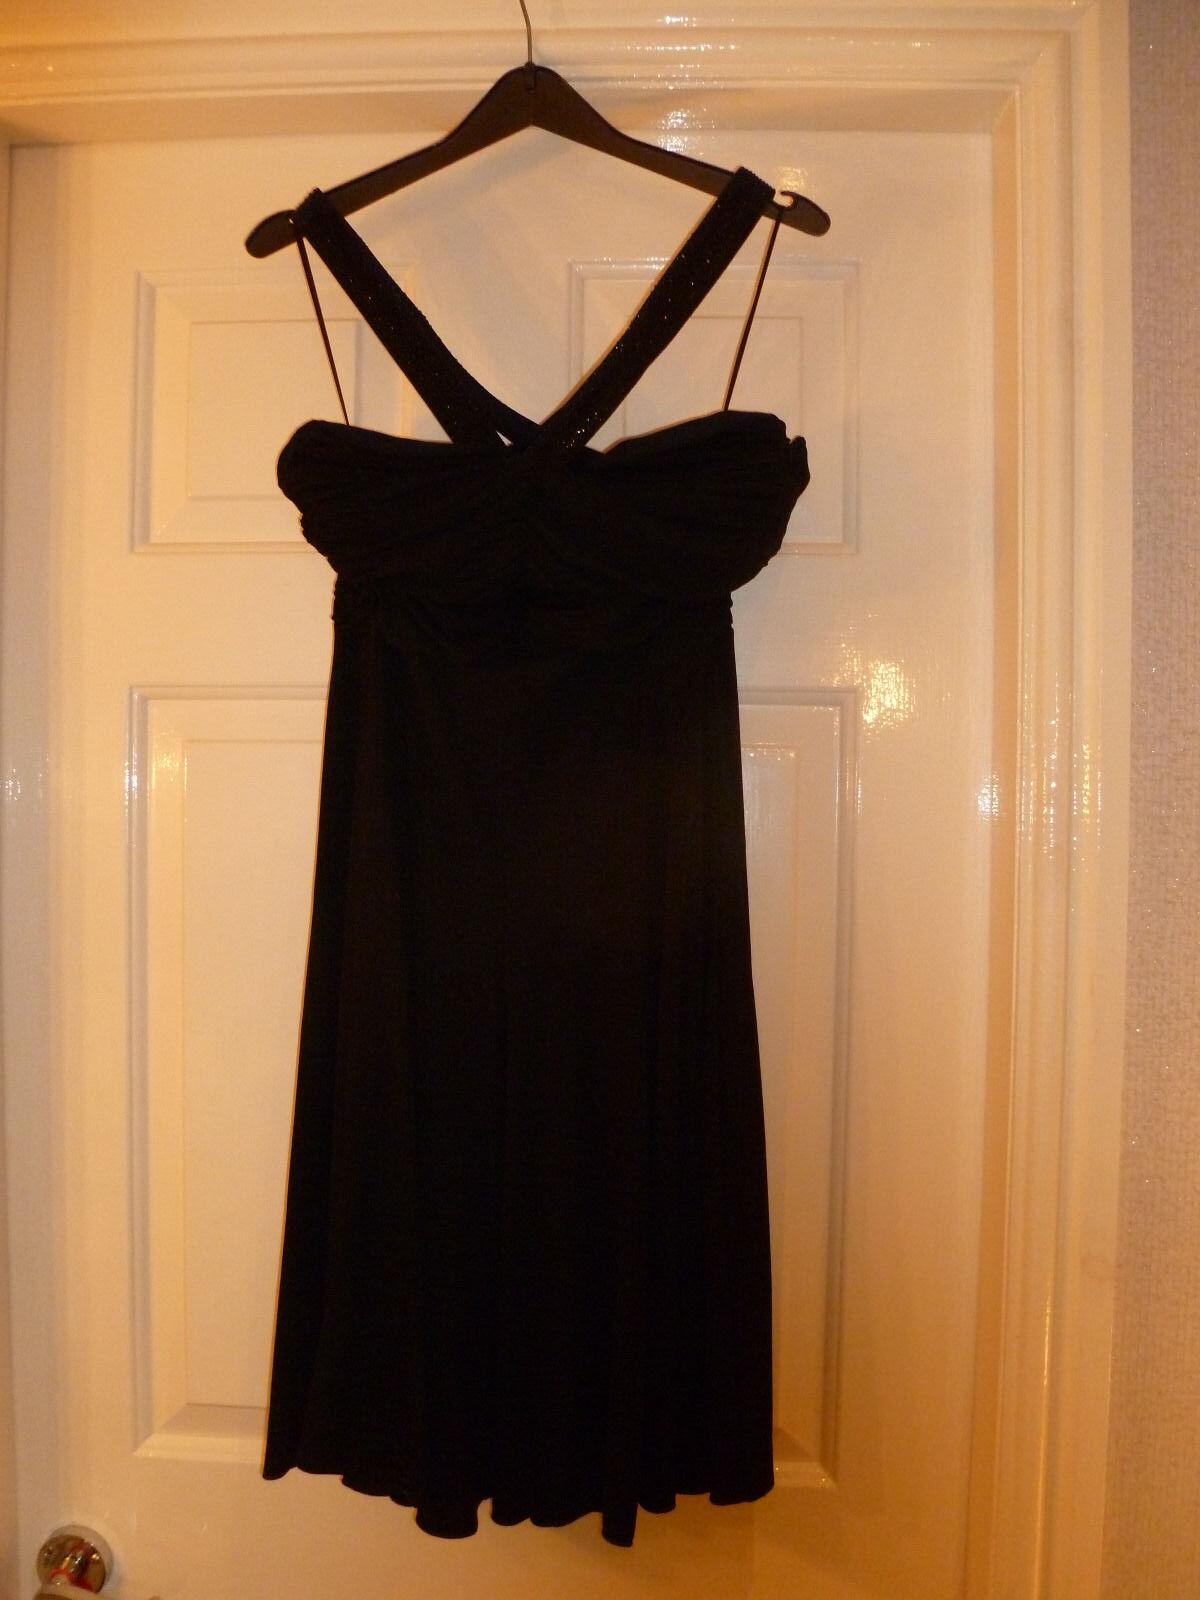 BNWOT Armani Collezioni evening dress size 8 cost